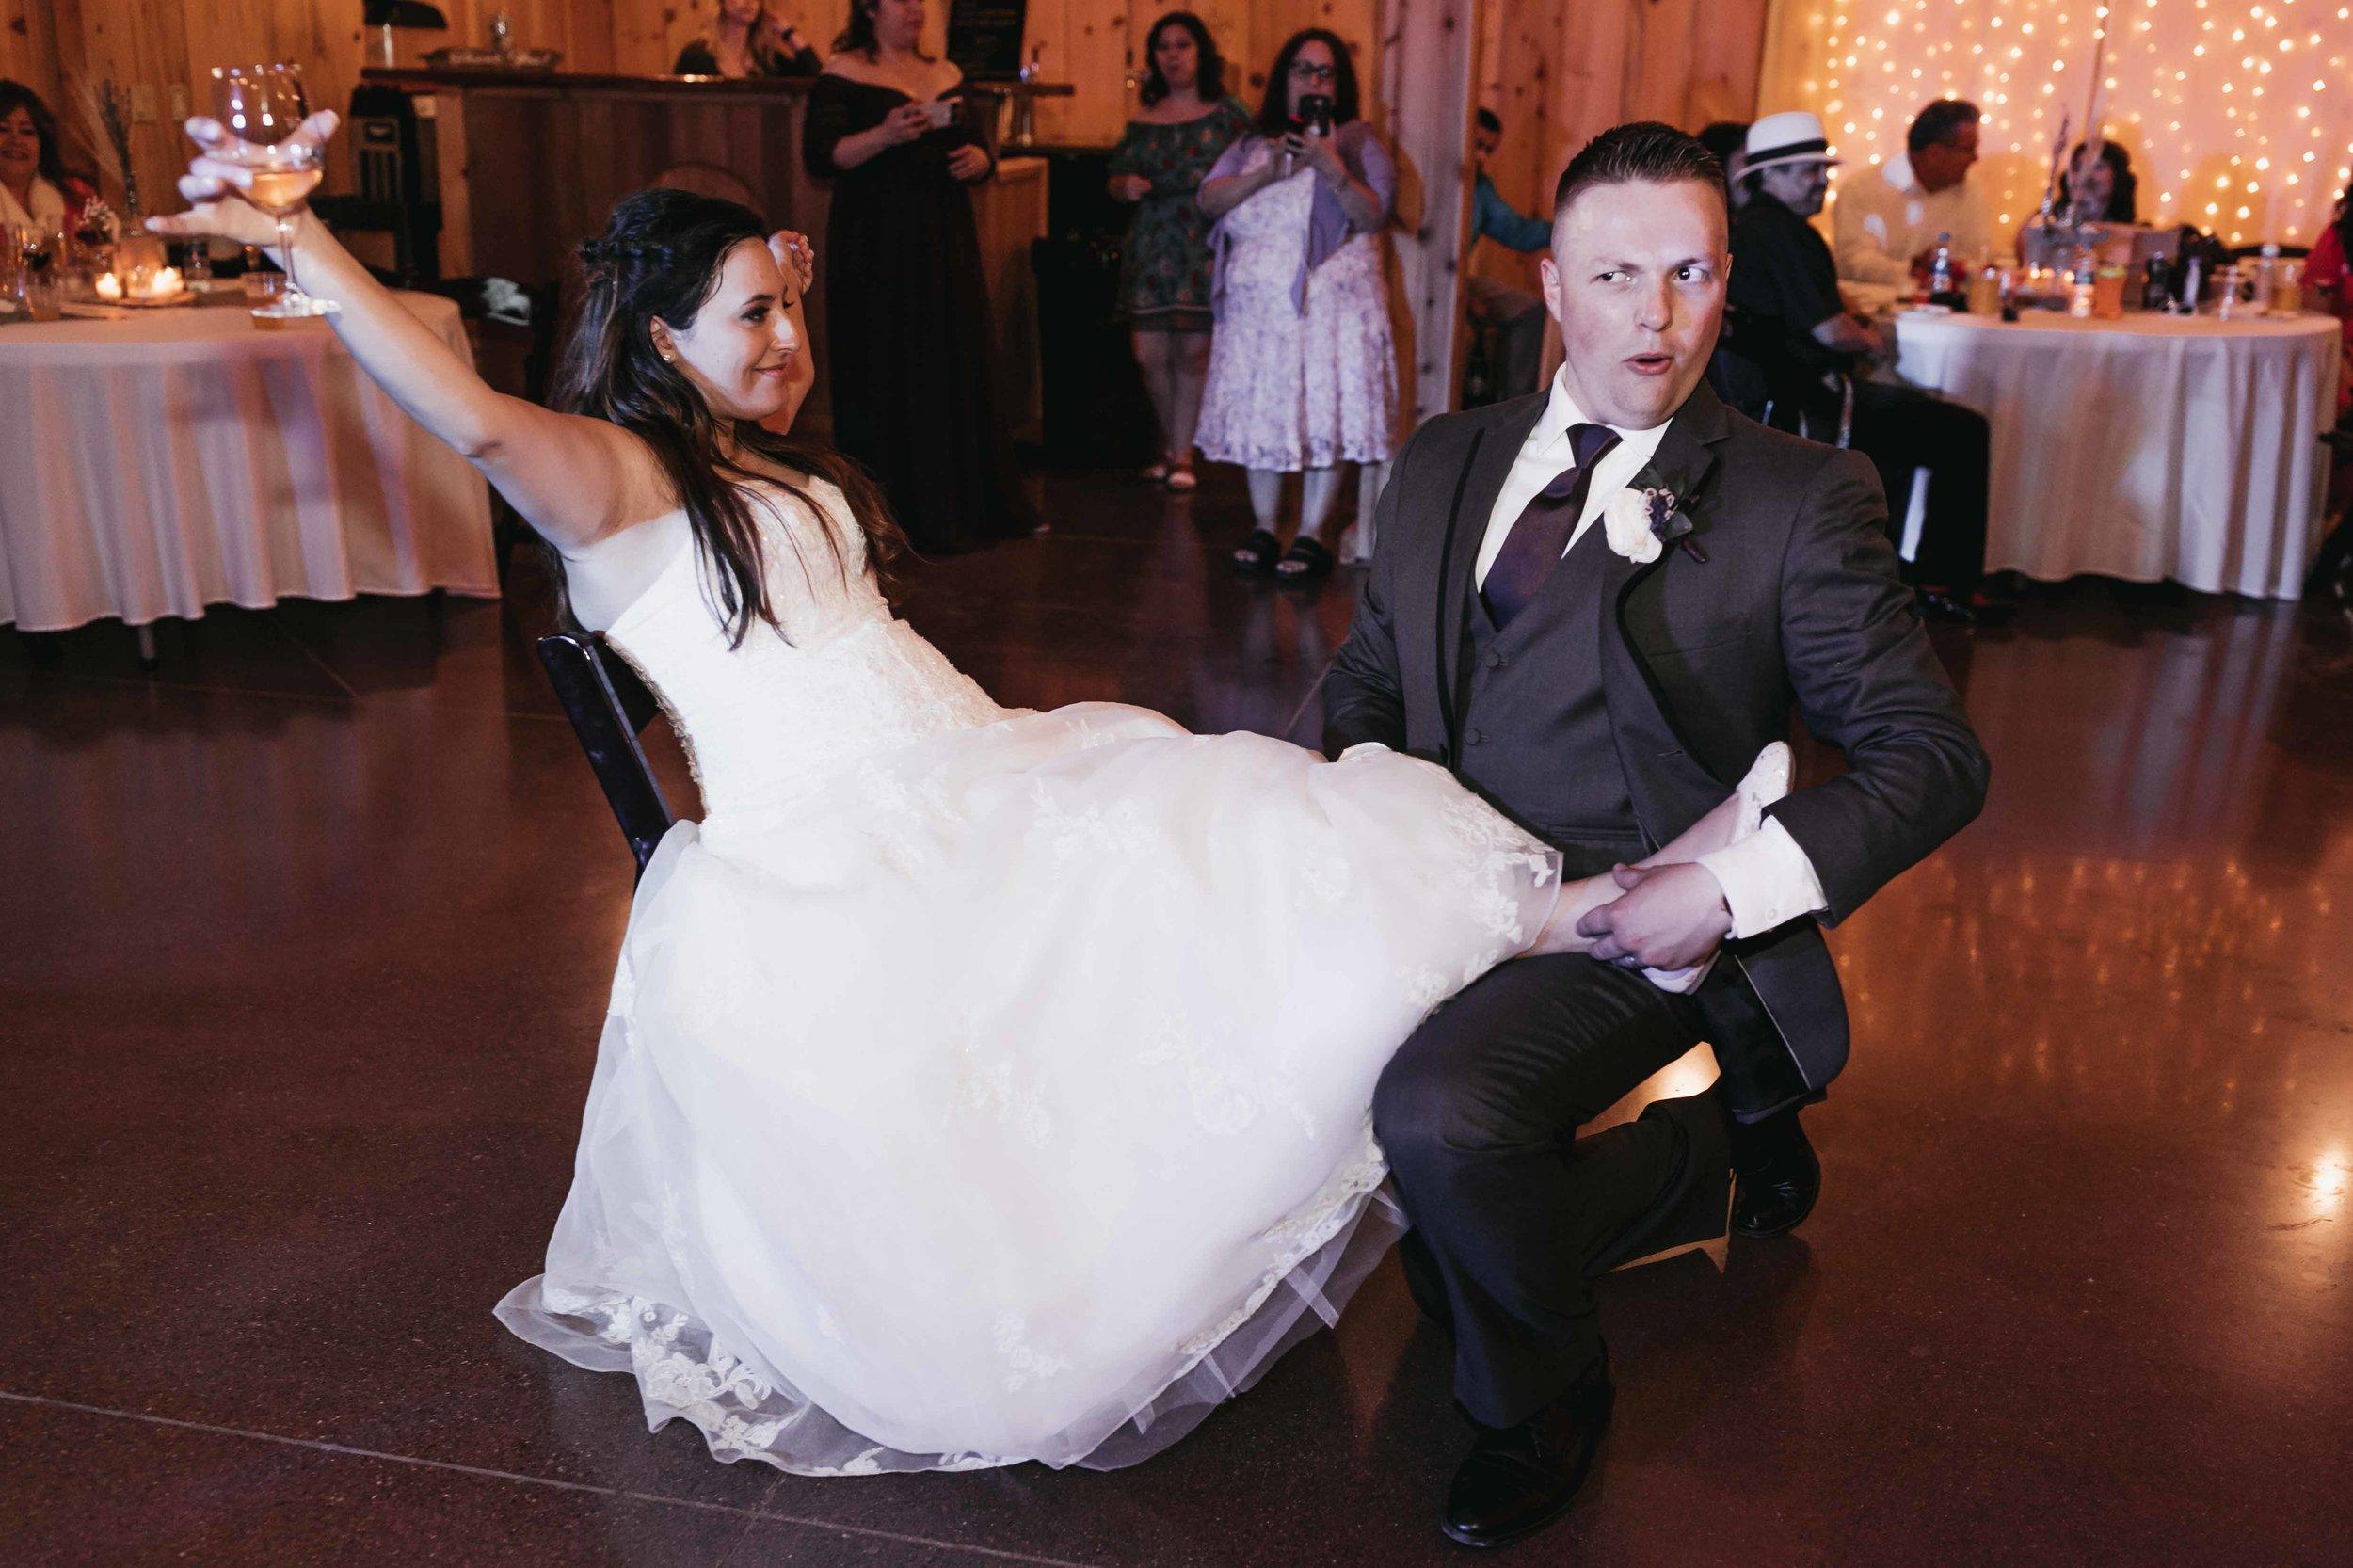 tuncannon-cellars-wedding-133.jpg